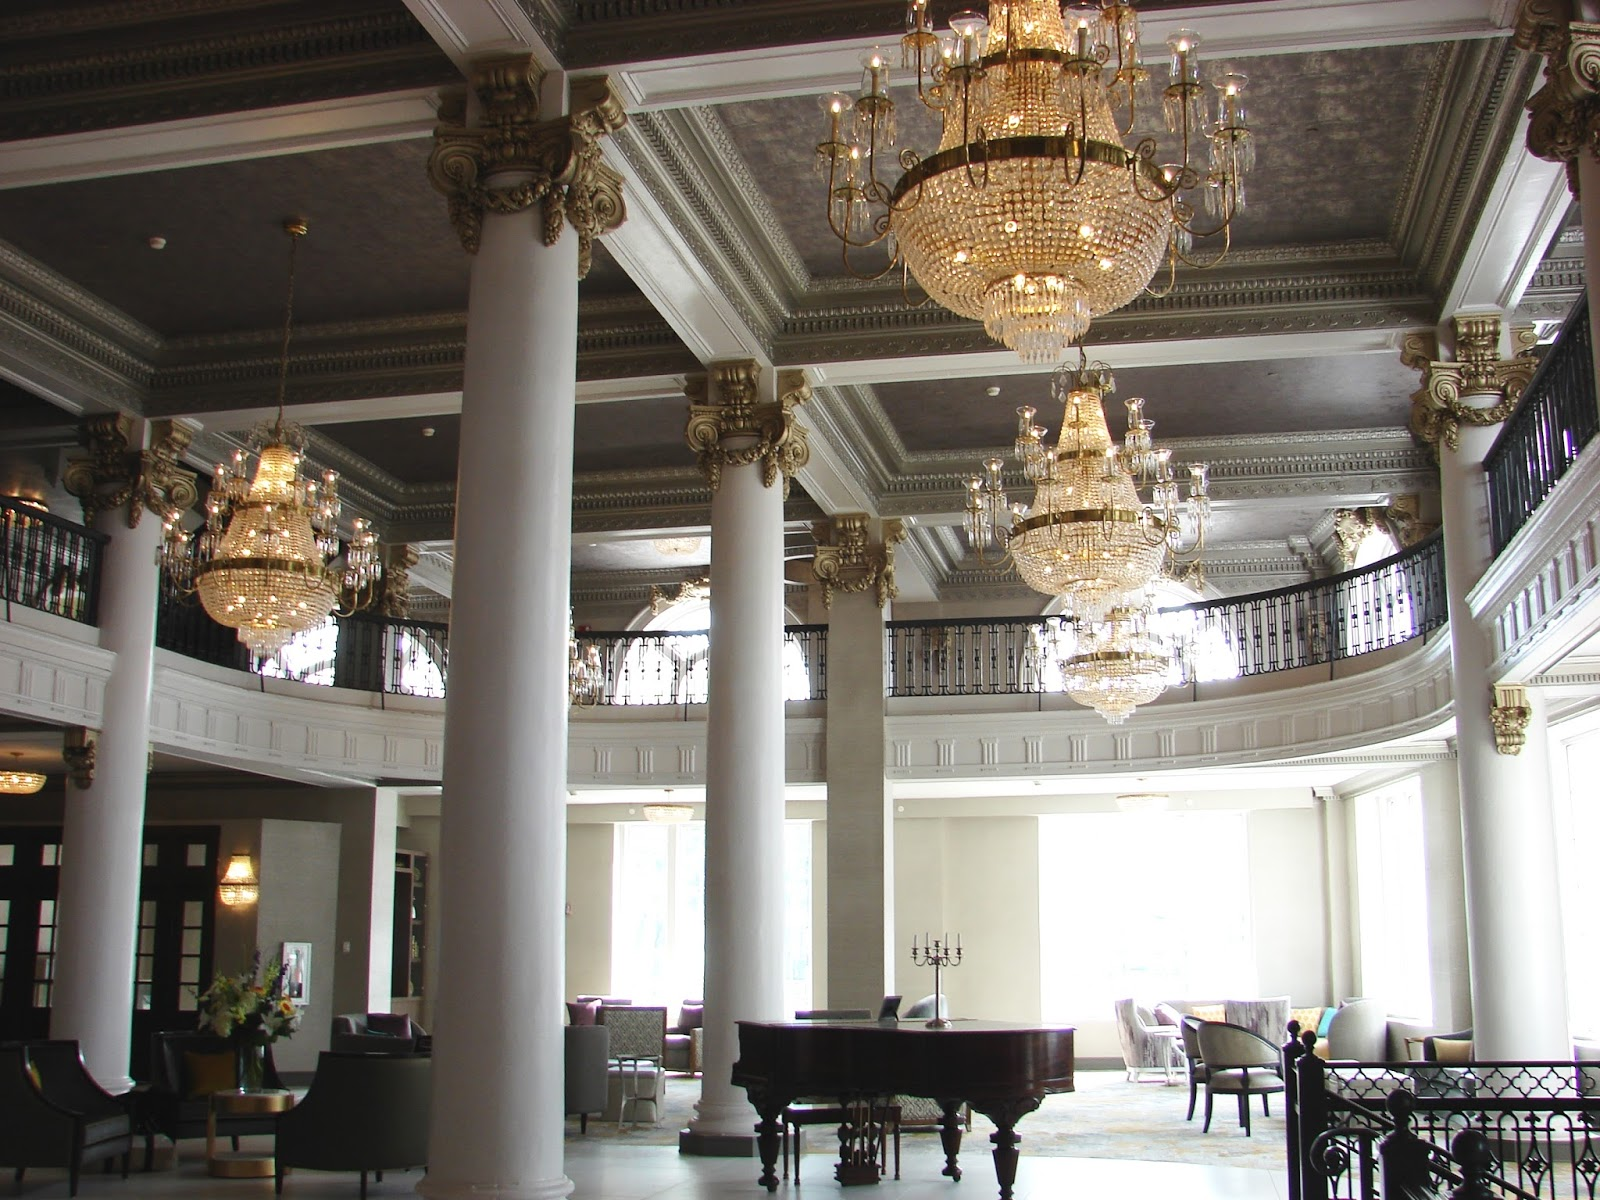 preferred accommodations hotel utica doubletree is elegant. Black Bedroom Furniture Sets. Home Design Ideas